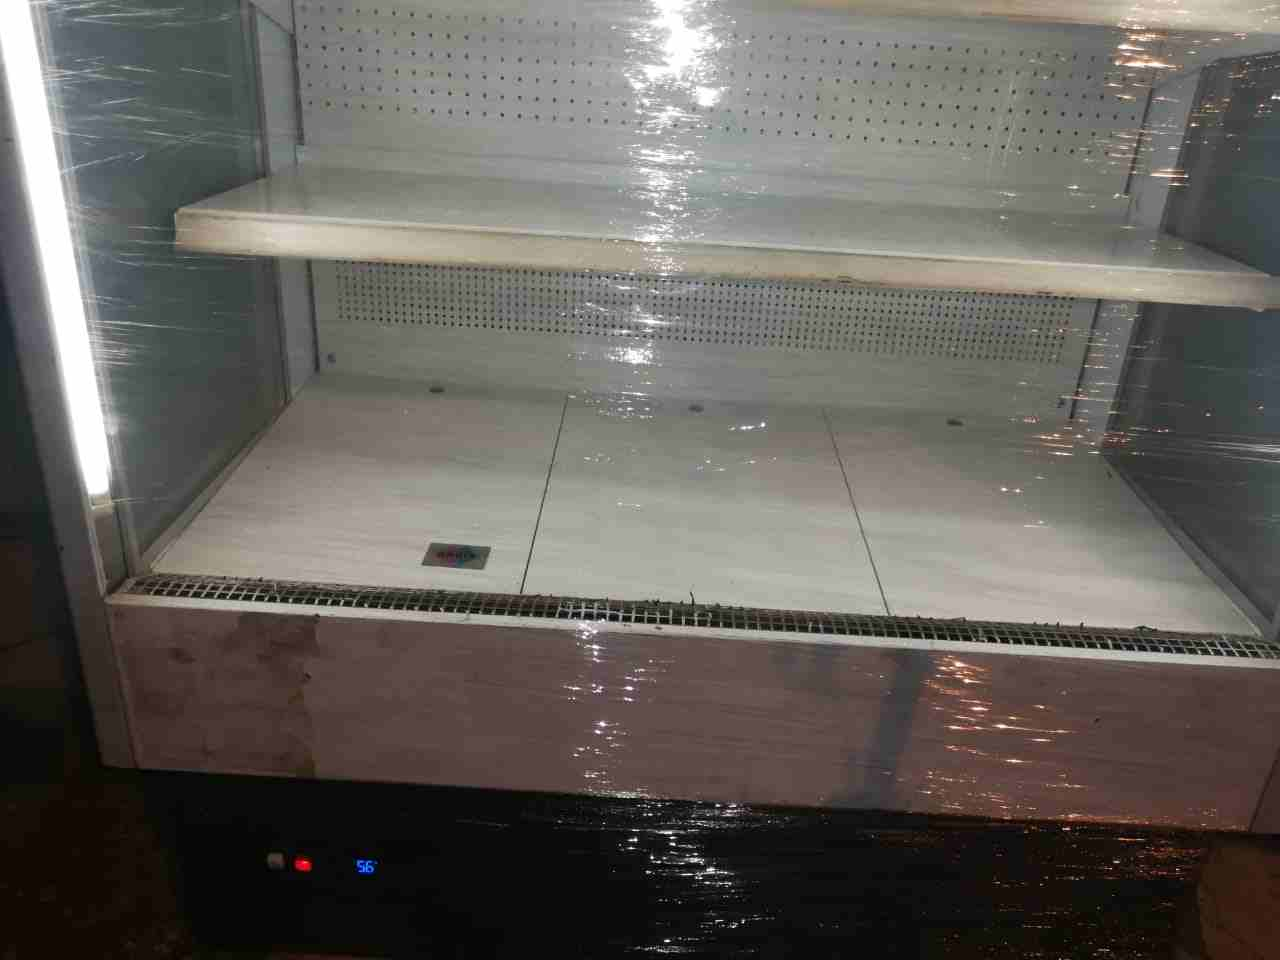 LG latest model fridge with 2doors up and down-  ثلاجة عرض مكشوفة. 1.20...